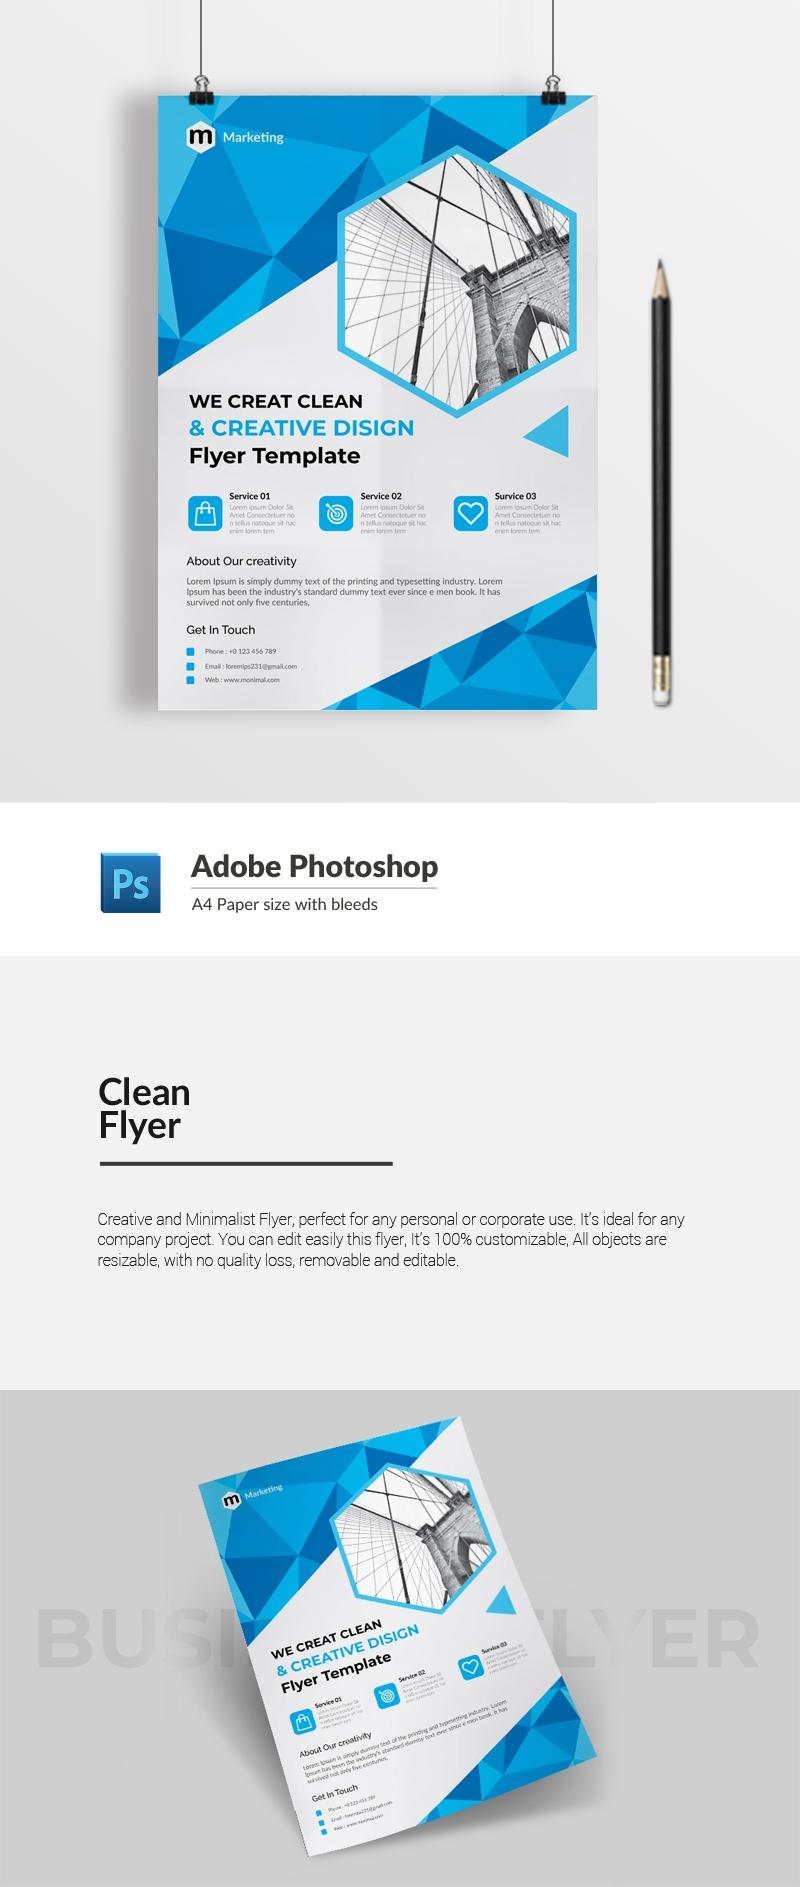 Clean Flyer